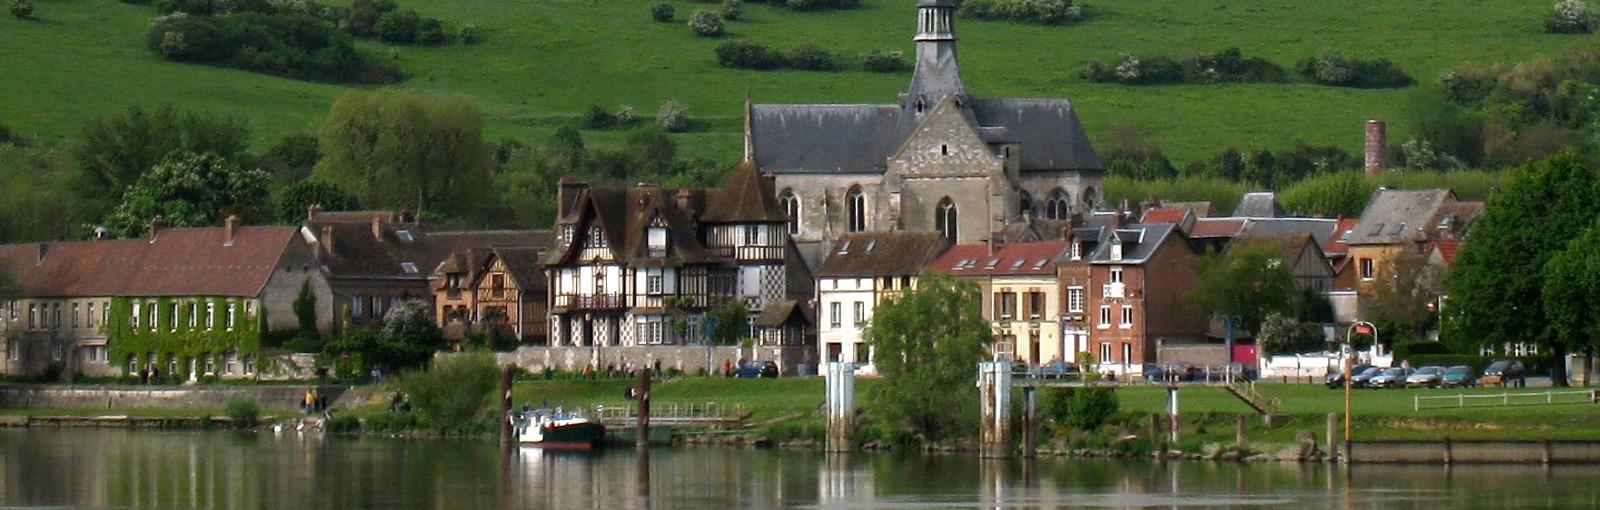 Tours Normandy off-the-beaten tracks: Rouen, the Norman abbeys route & the Alabaster coast - 诺曼底 - 从巴黎出发的多日游